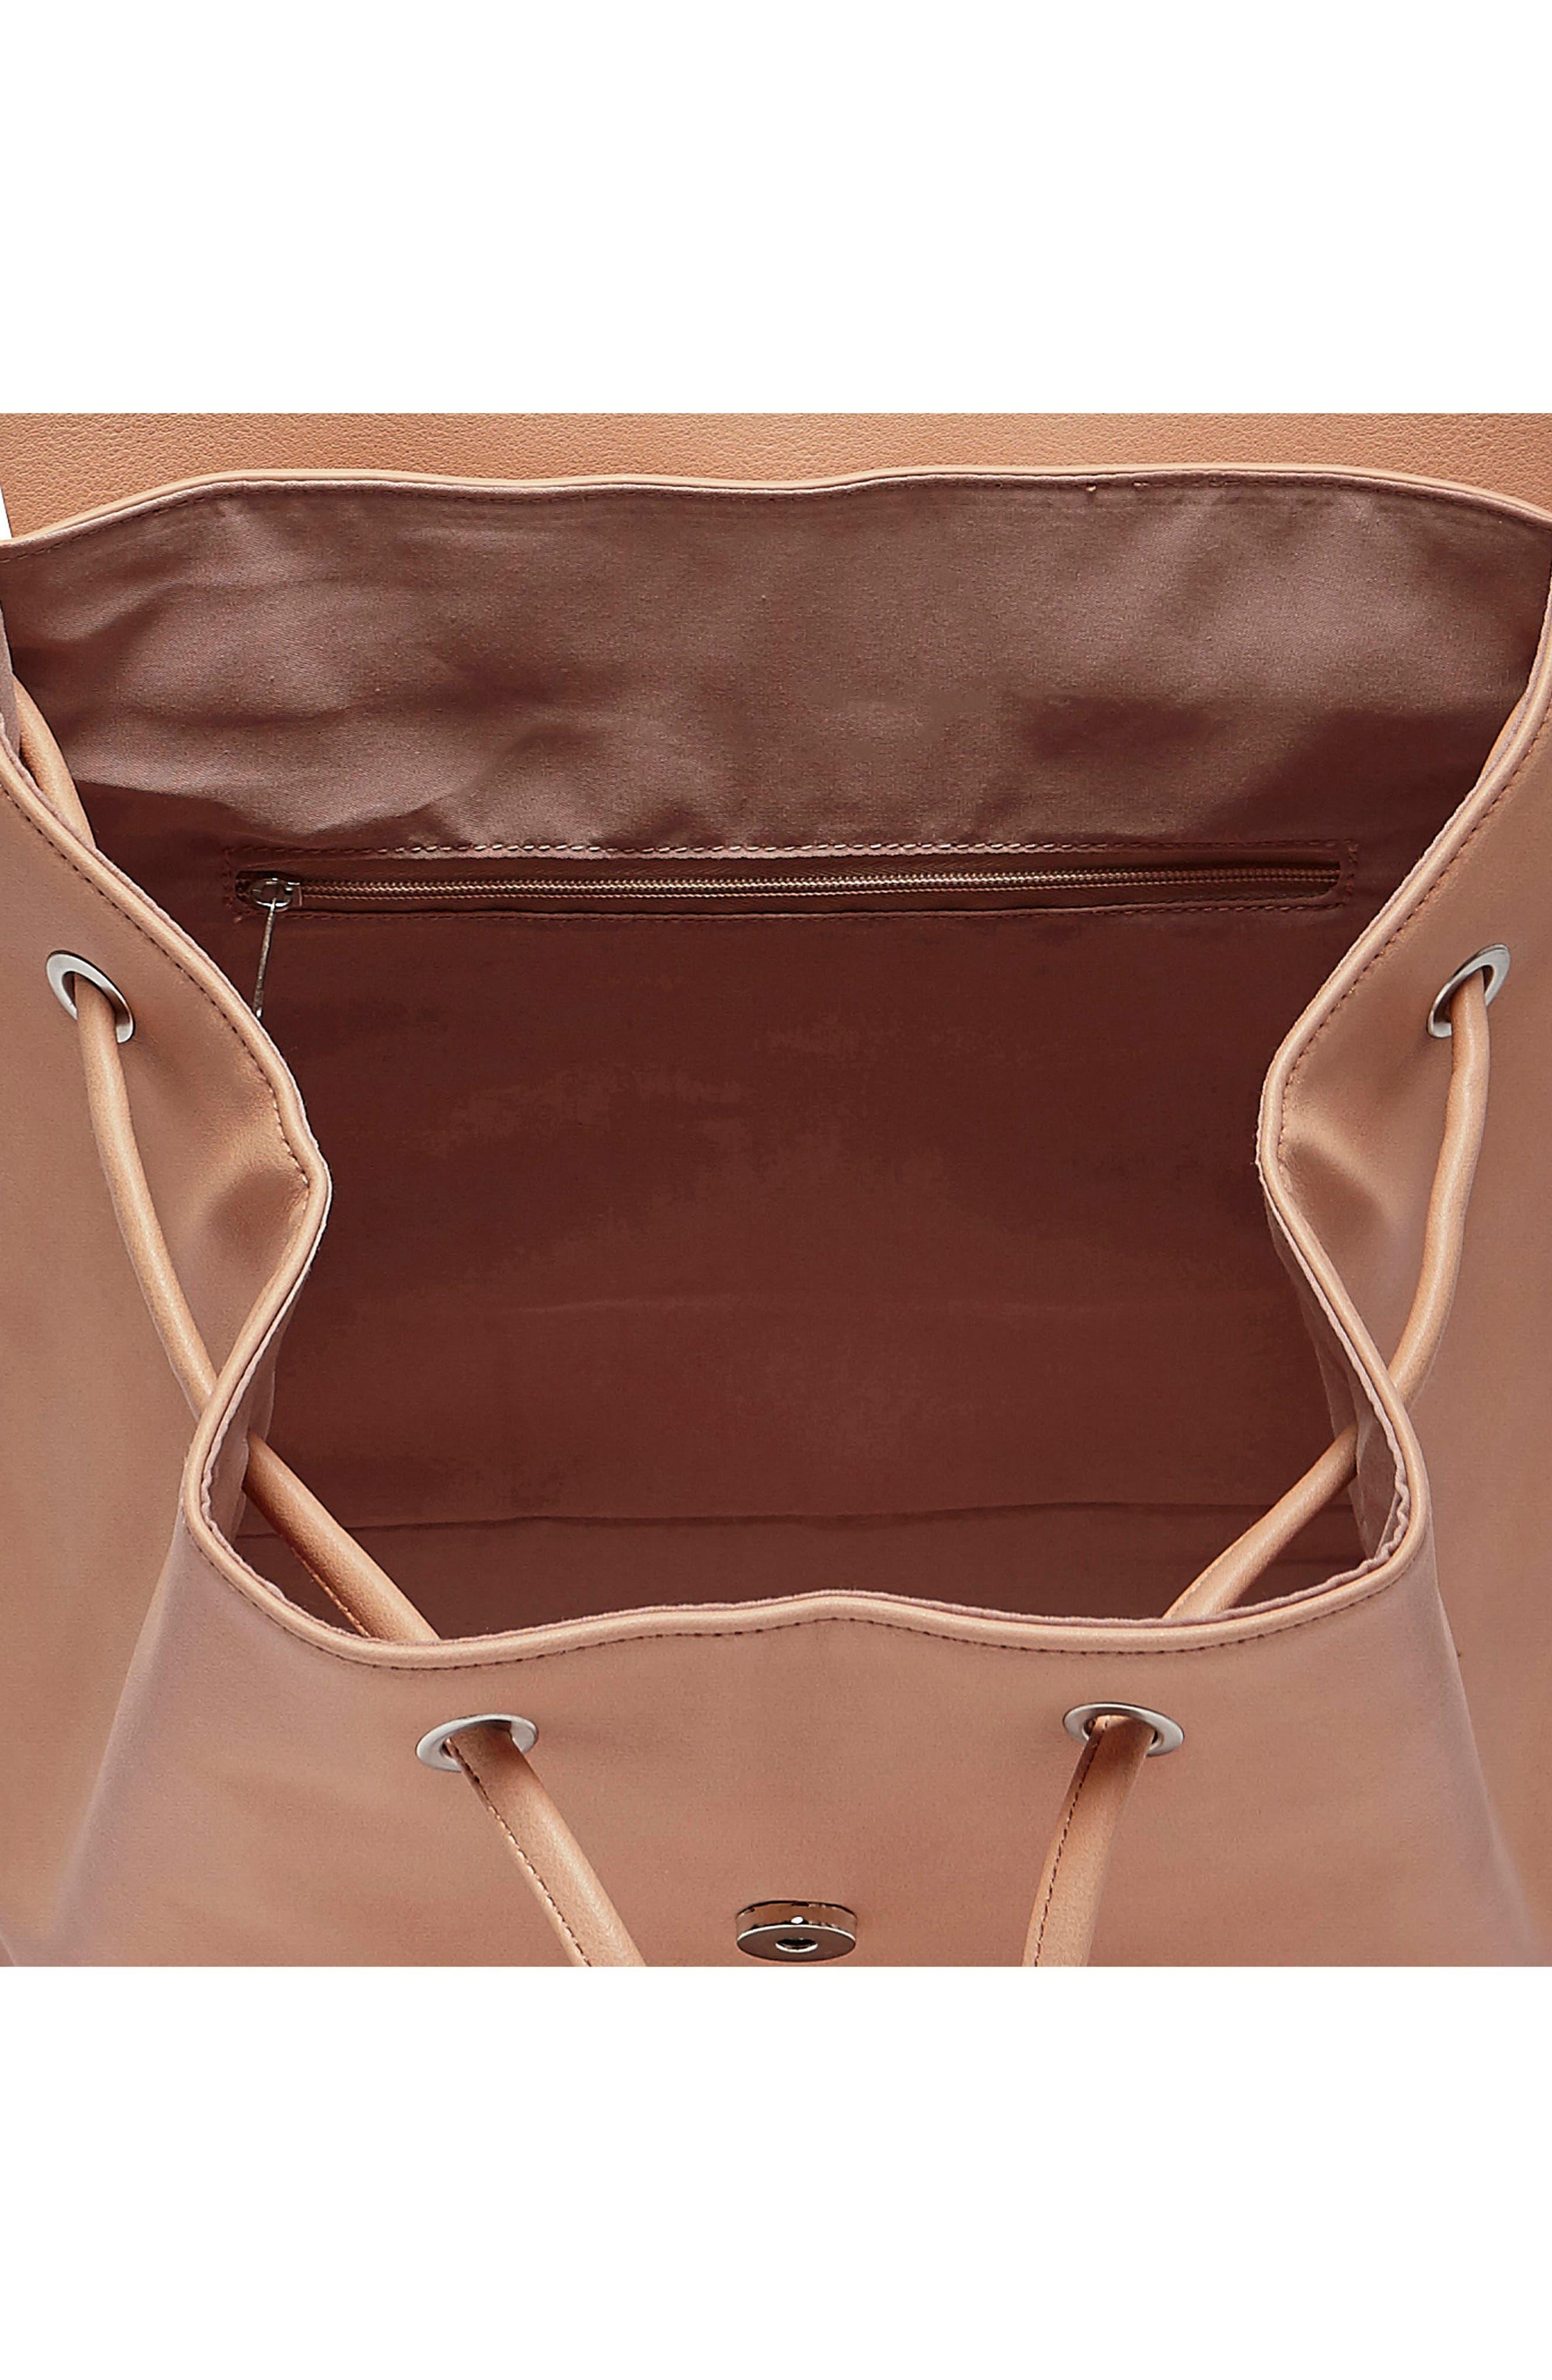 Midnight Vegan Leather Flap Backpack,                             Alternate thumbnail 6, color,